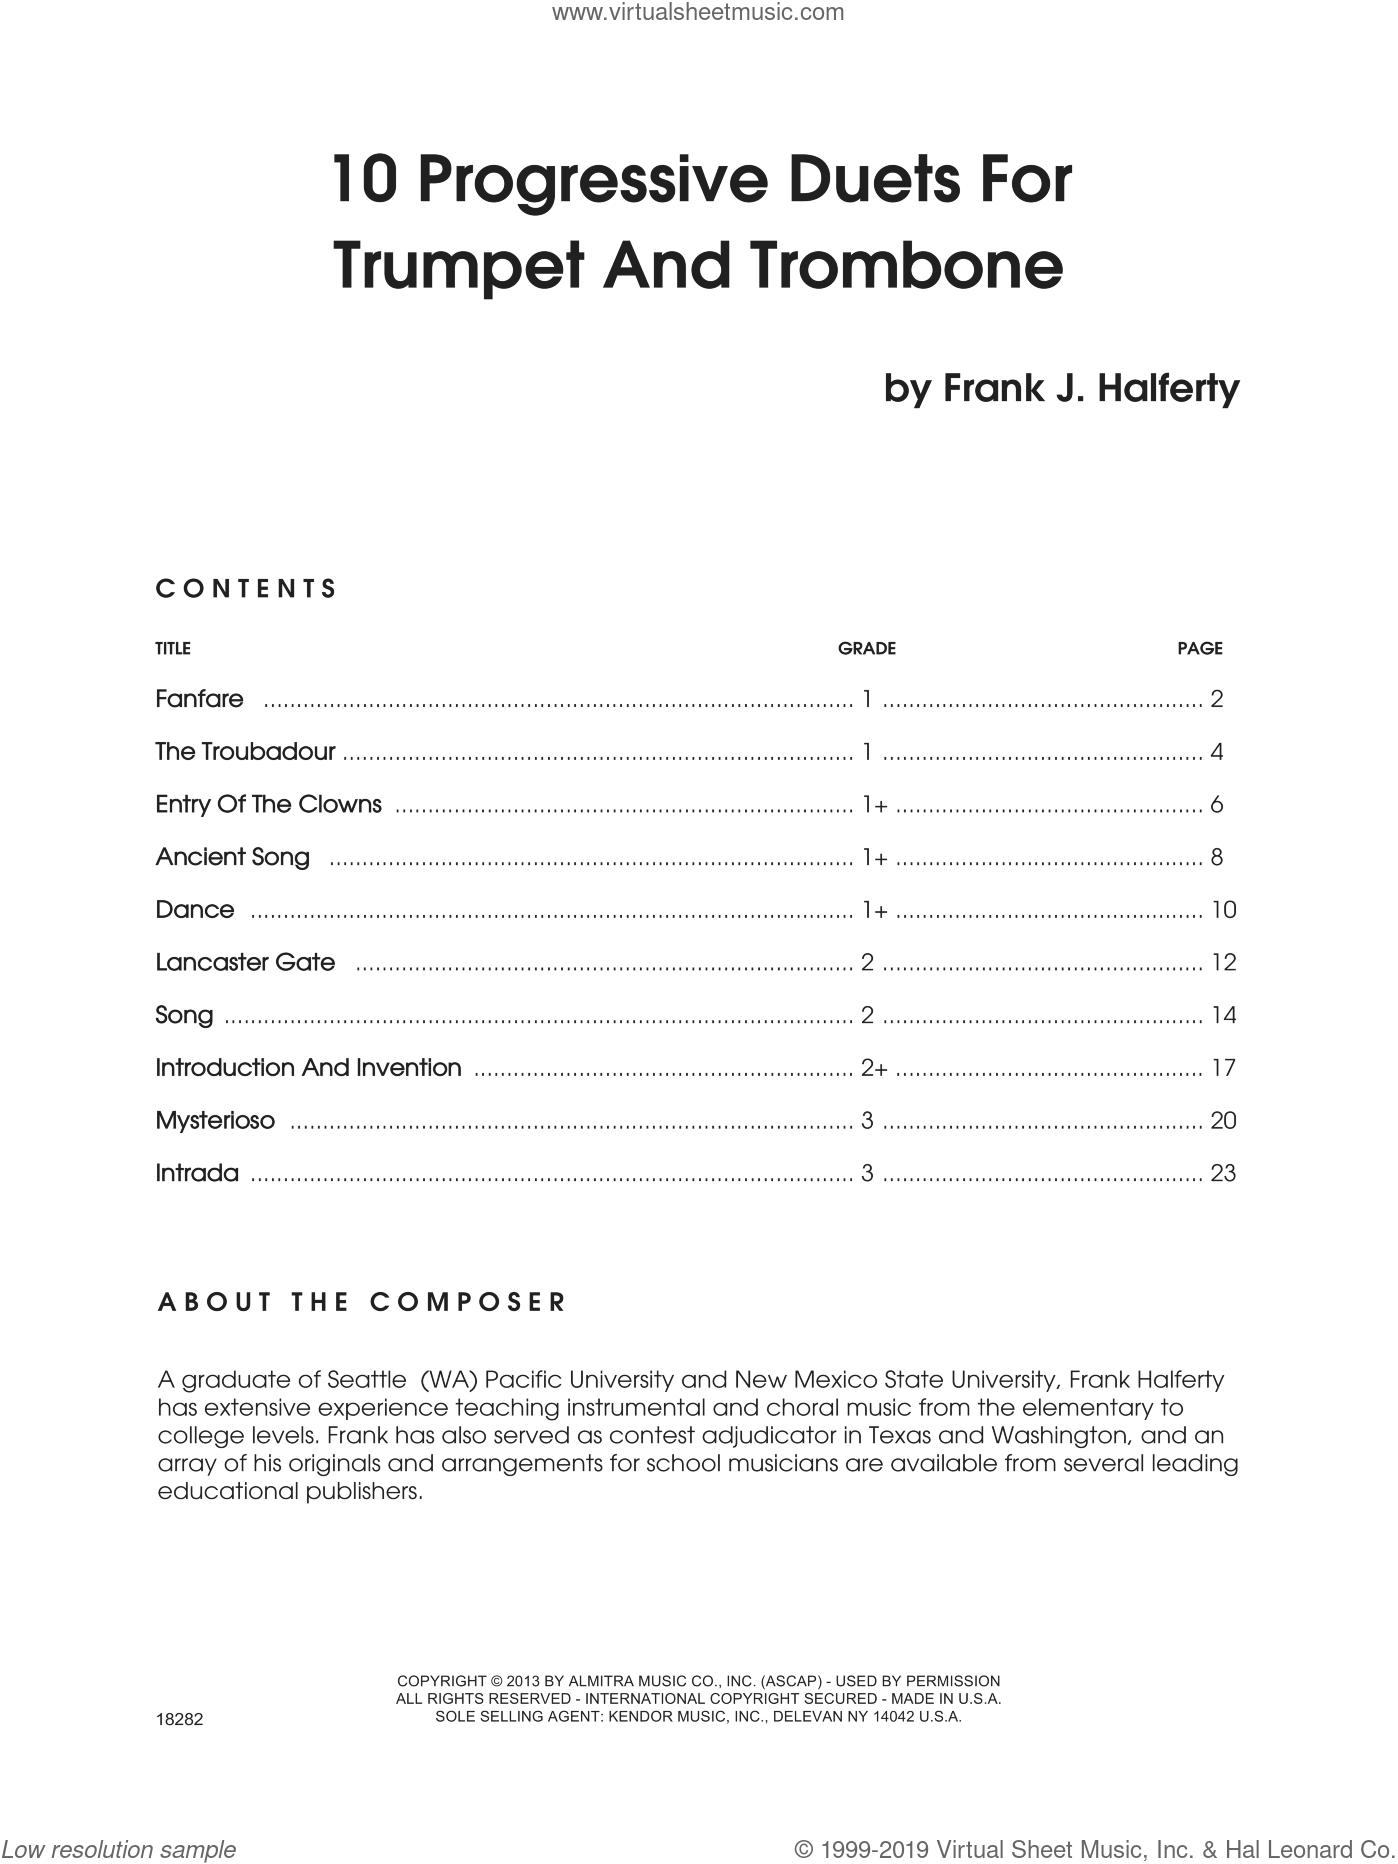 10 Progressive Duets For Trumpet And Trombone sheet music for trumpet and trombone by Frank J. Halferty, classical score, intermediate duet